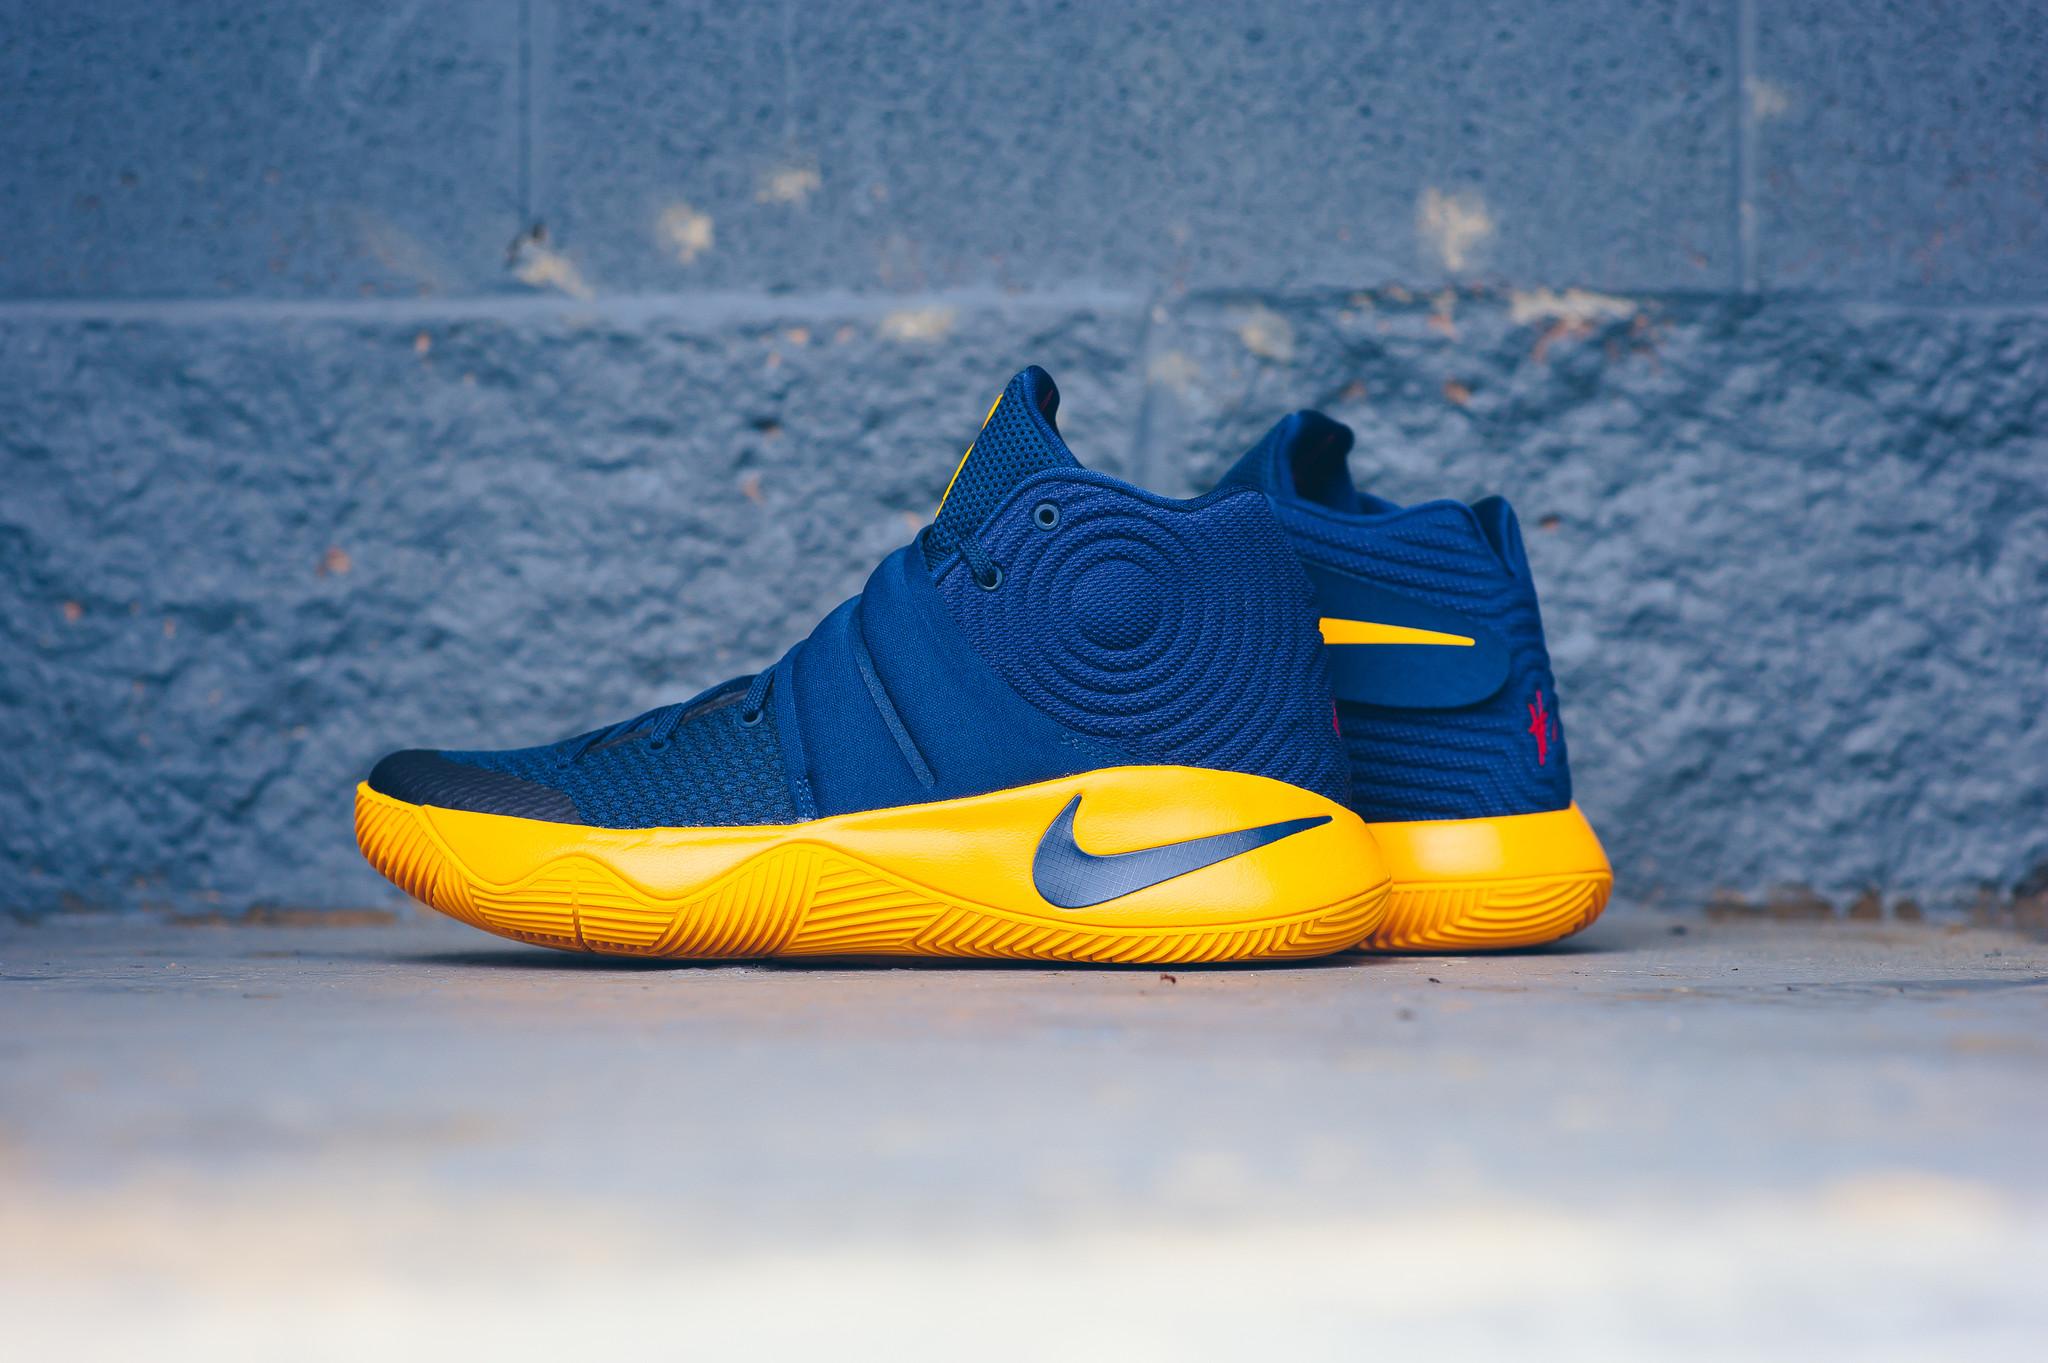 new style b5a0a 306a2 The Nike Kyrie 2 Cavs Drops Next Week • KicksOnFire.com